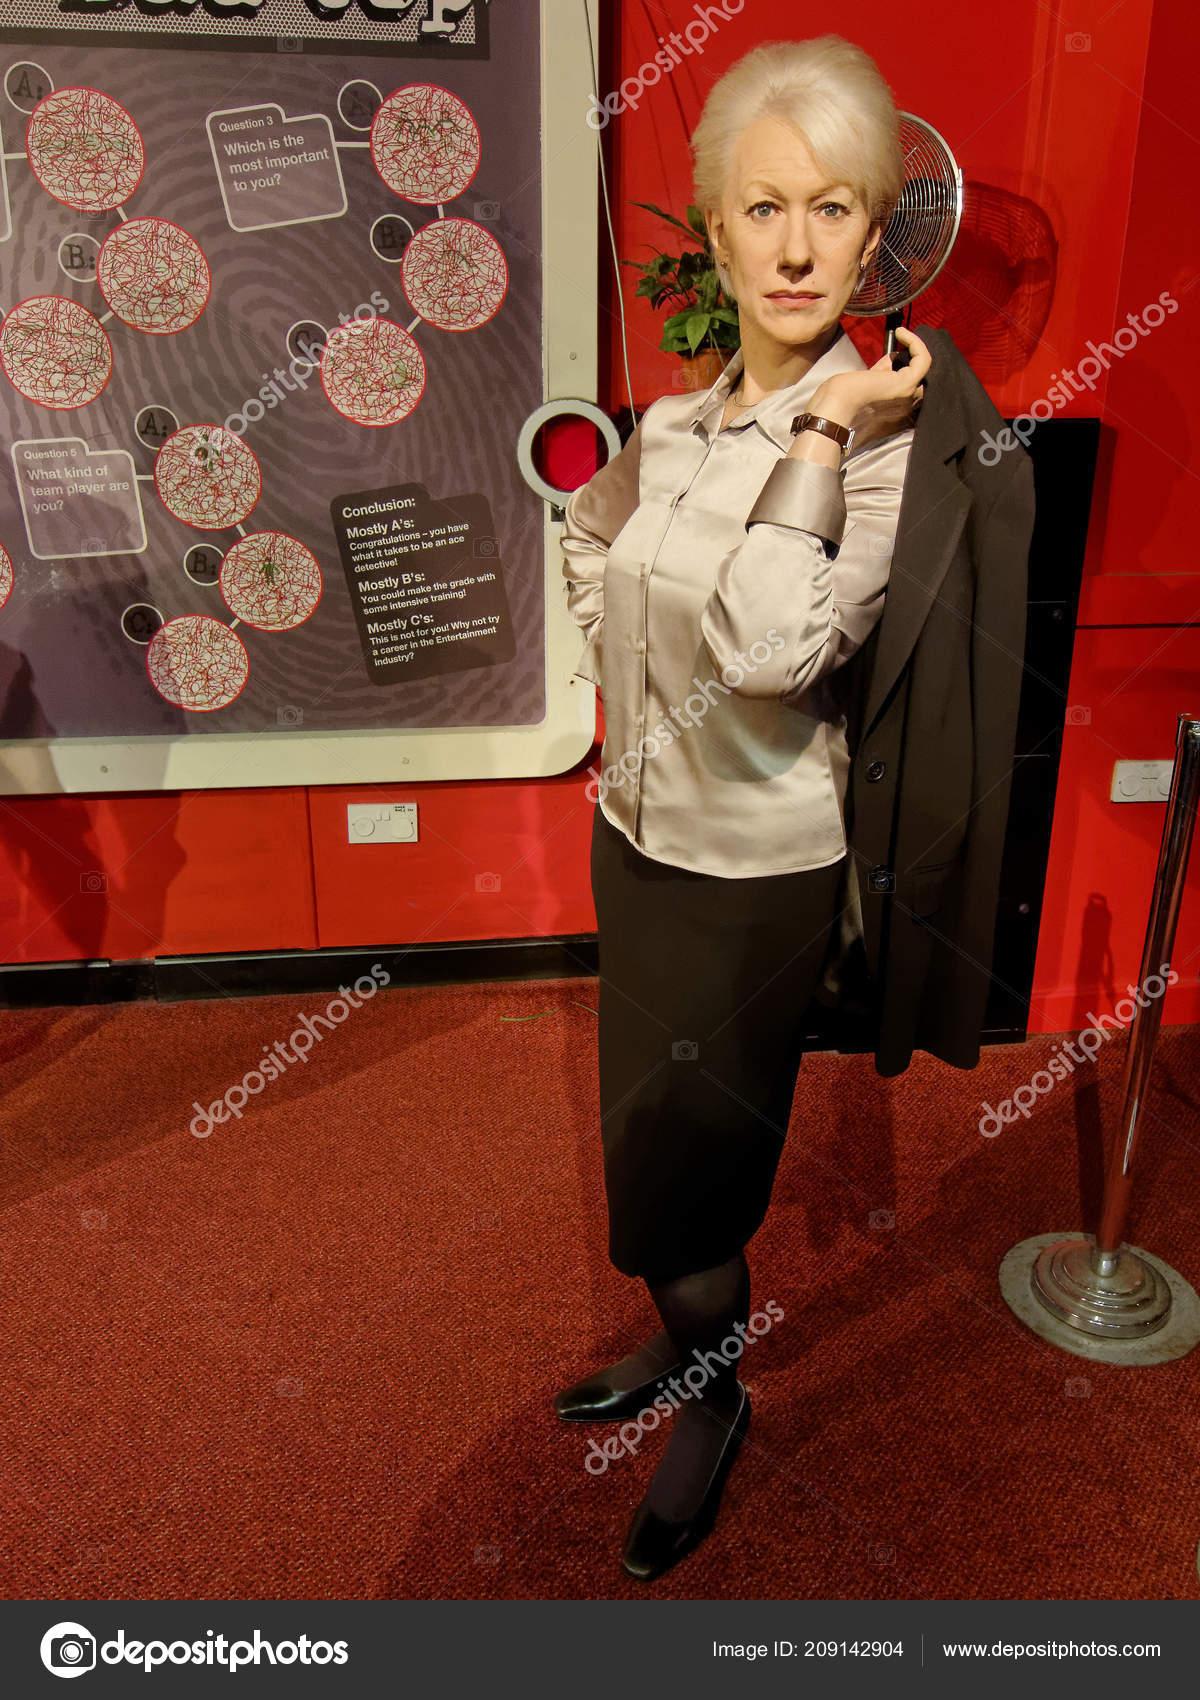 bb32c81f63e Αθήνα Ιανουαρίου Madame Tussauds Μπλάκπουλ Ηνωμένο Βασίλειο 2018 Σχήμα  Κερί– Εκδοτικές Φωτογραφίες Αρχείου